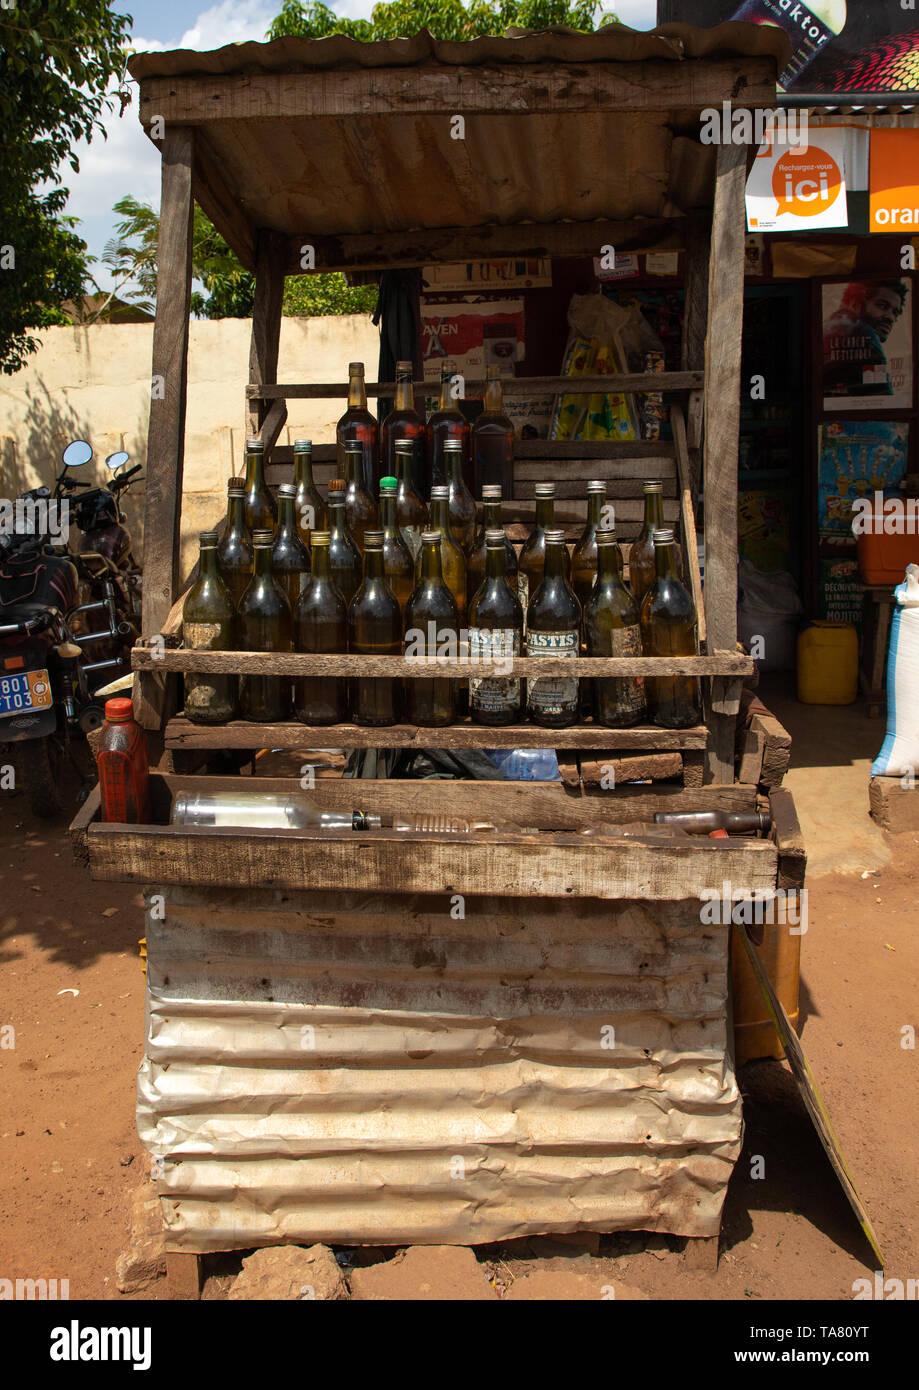 African gas station selling gasoline in bottles along the road, Poro region, Korhogo, Ivory Coast Stock Photo